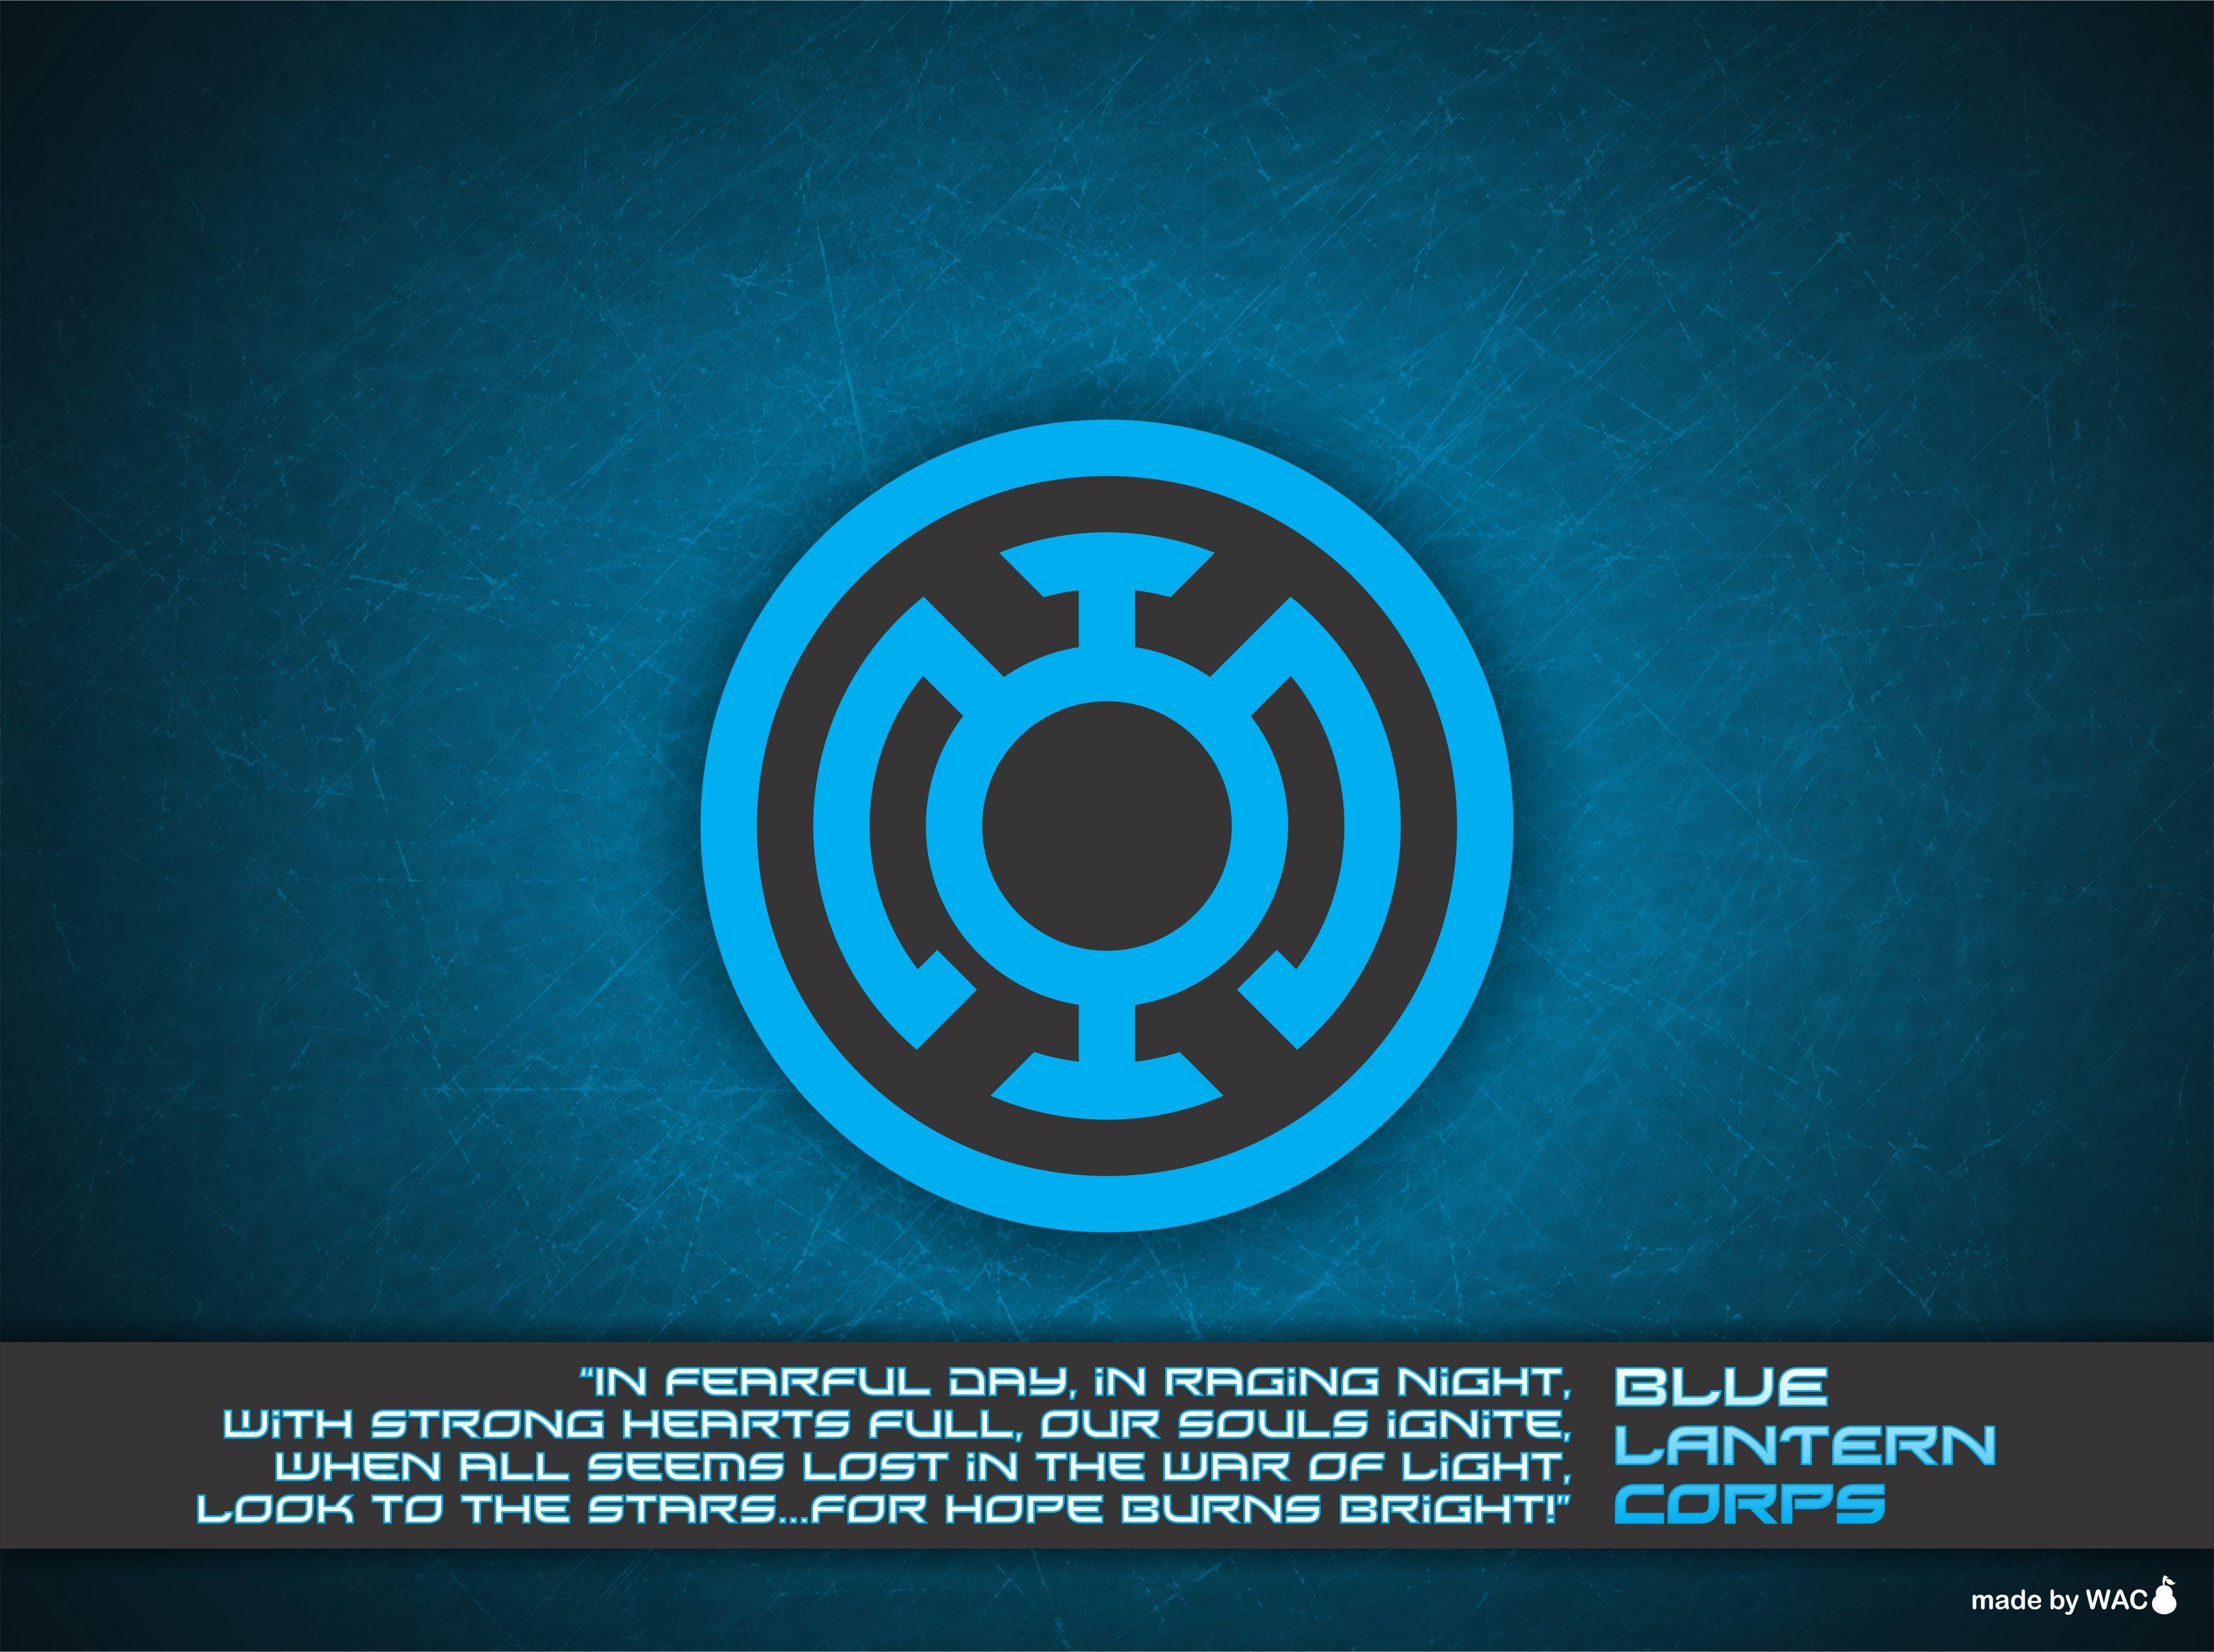 Blue Lantern Corps Oath Green Lantern Pinterest Blue Lantern